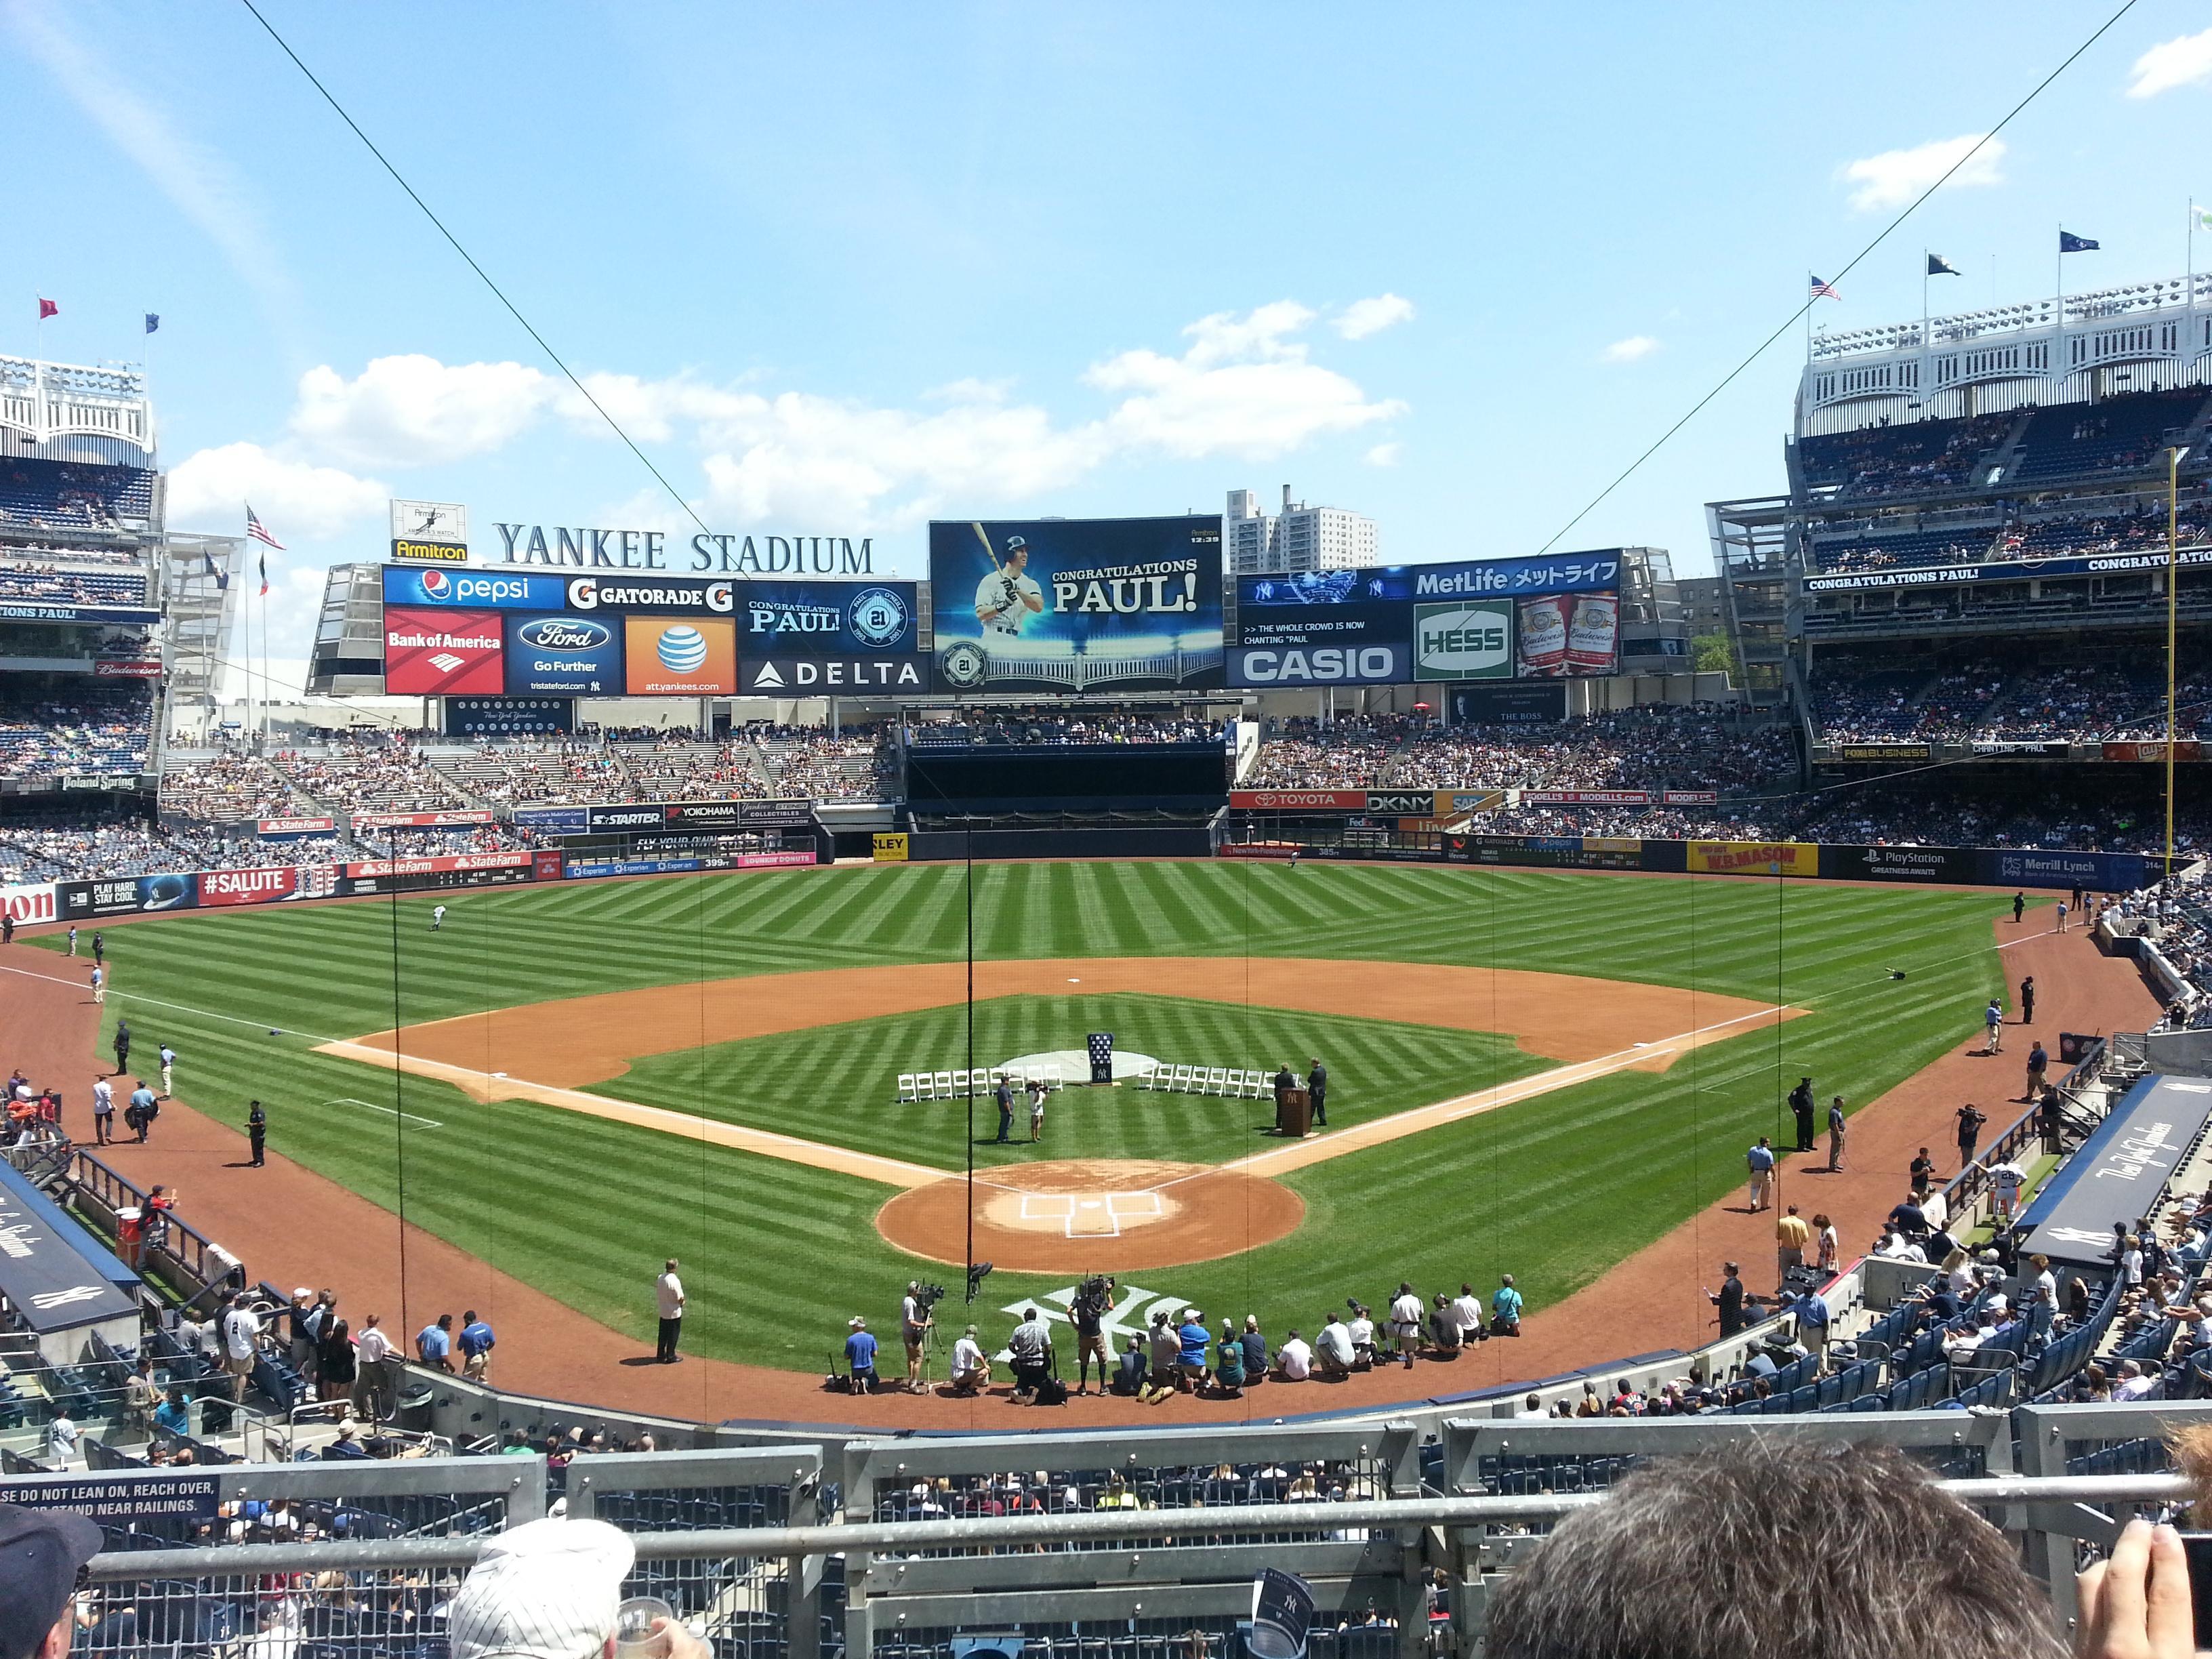 Yankee Stadium Secção 220B Fila 4 Lugar 10